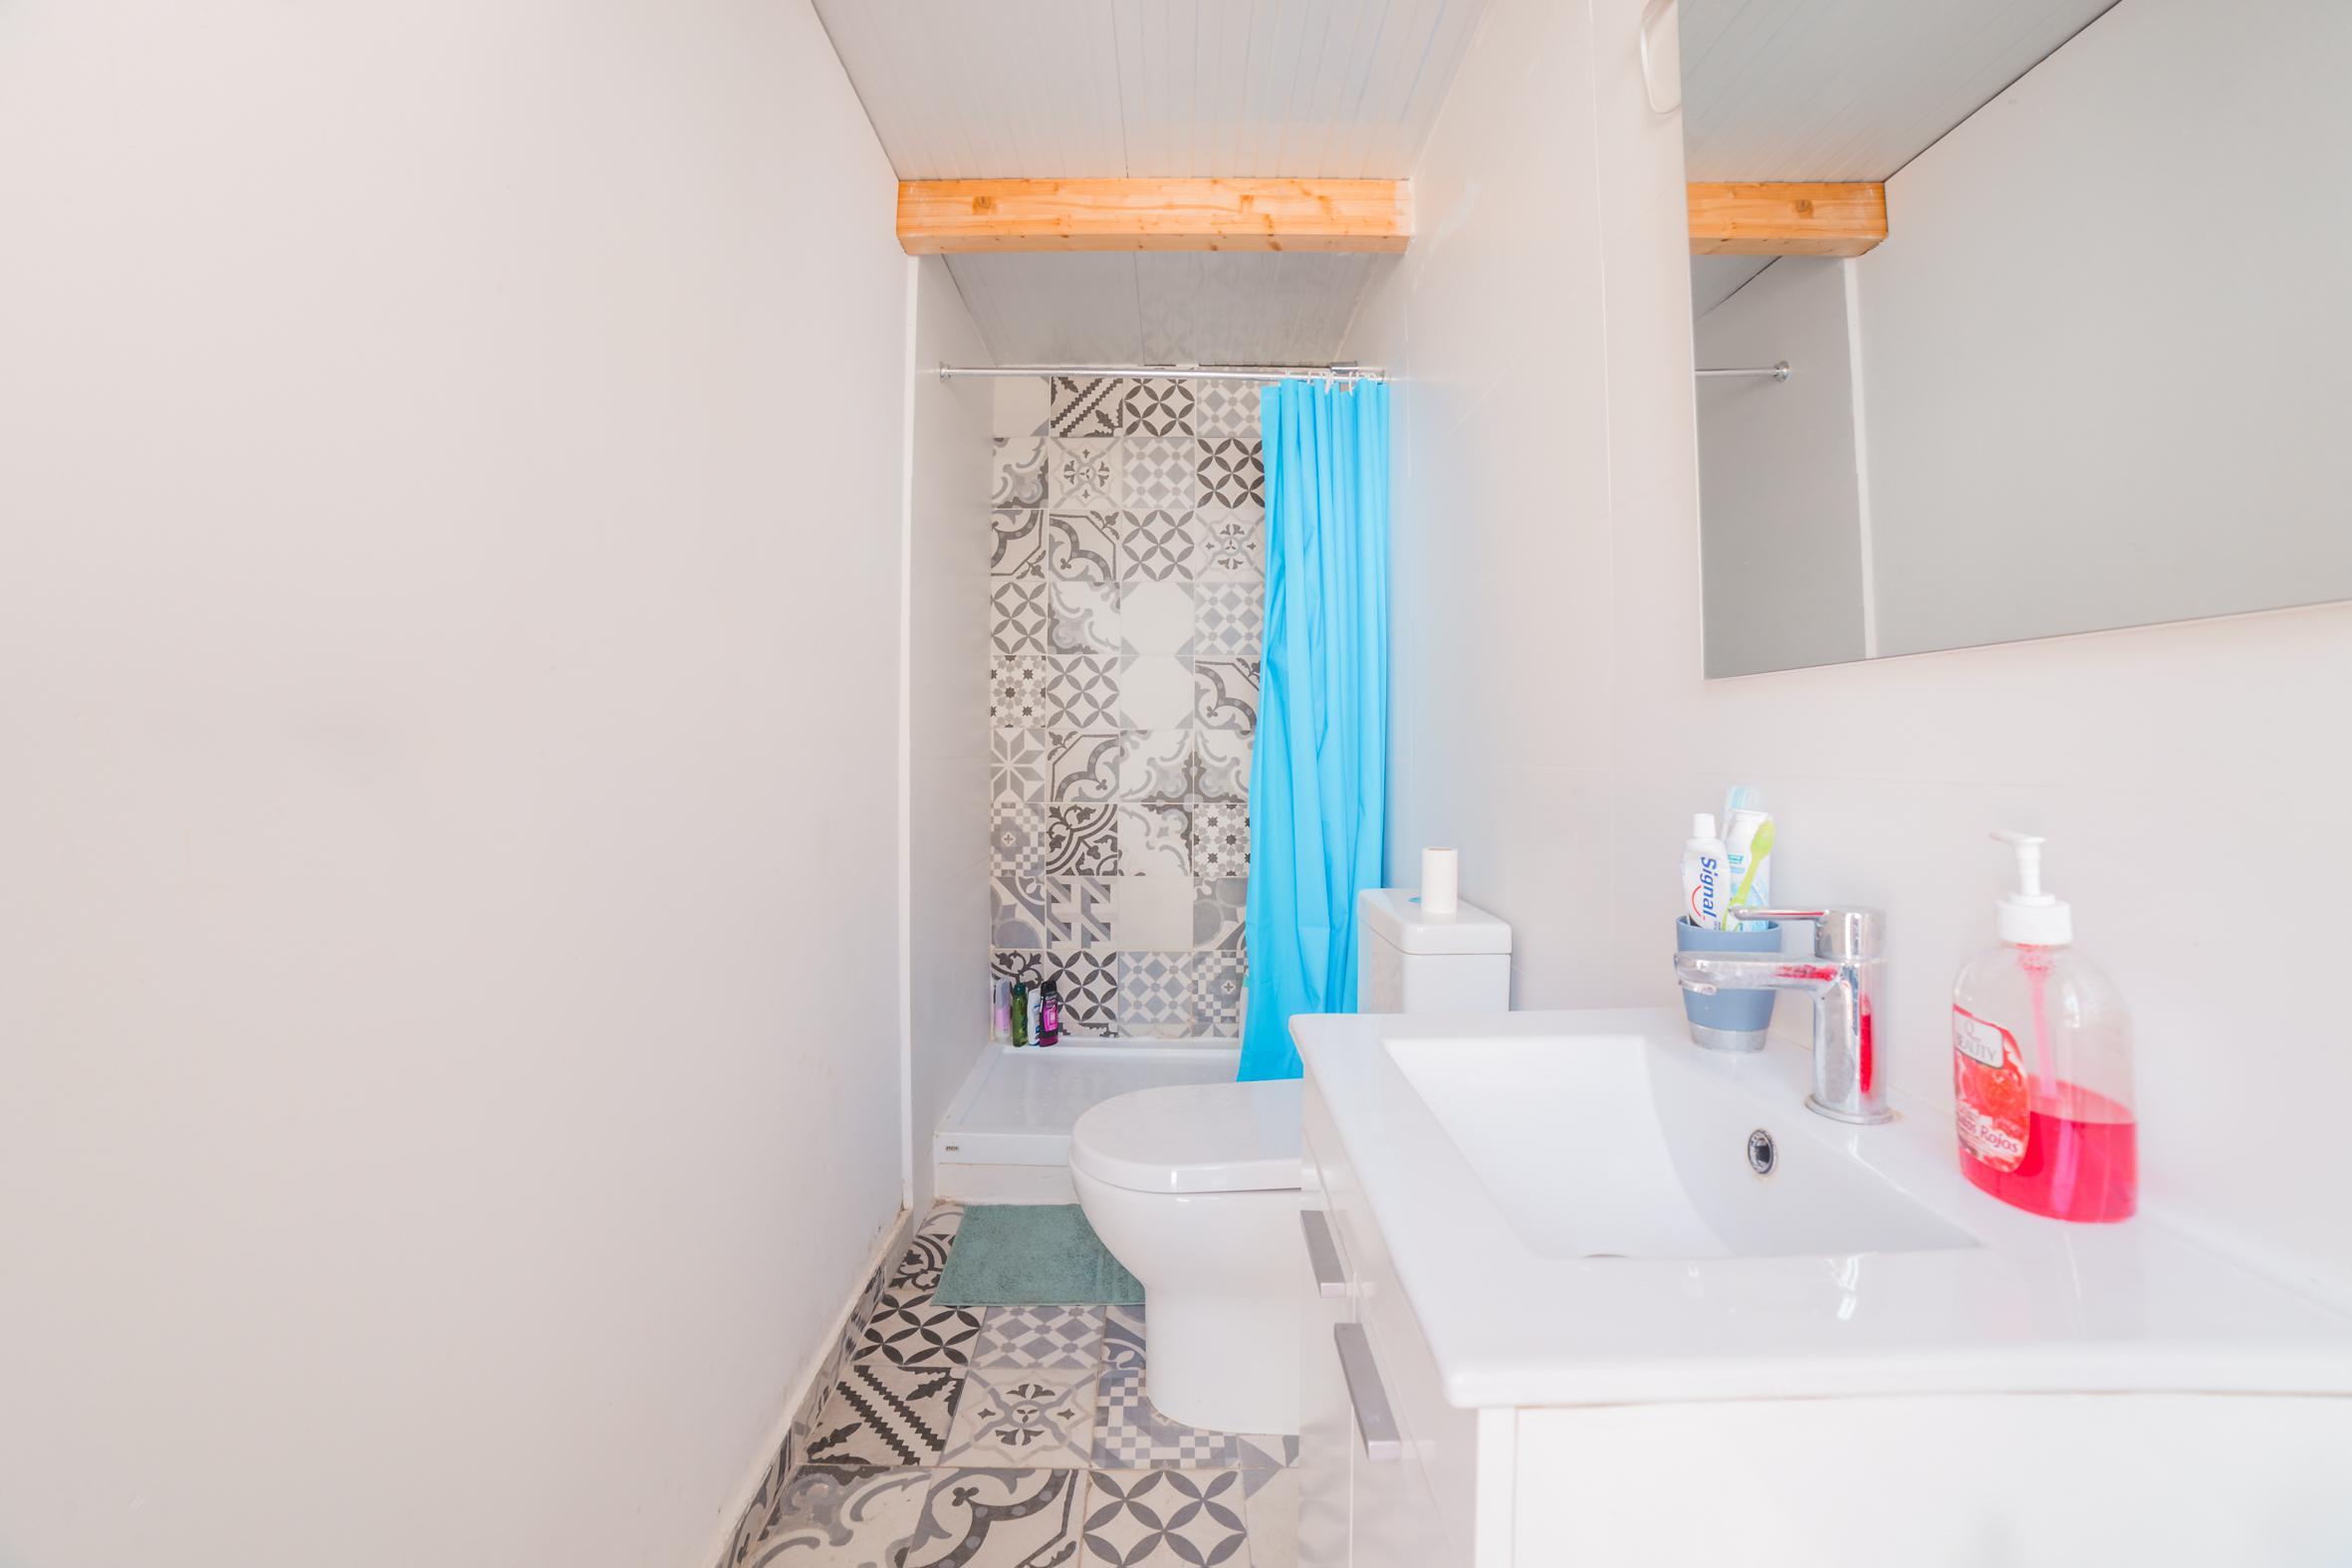 251960 House for sale in Eixample, Sagrada Familia 12